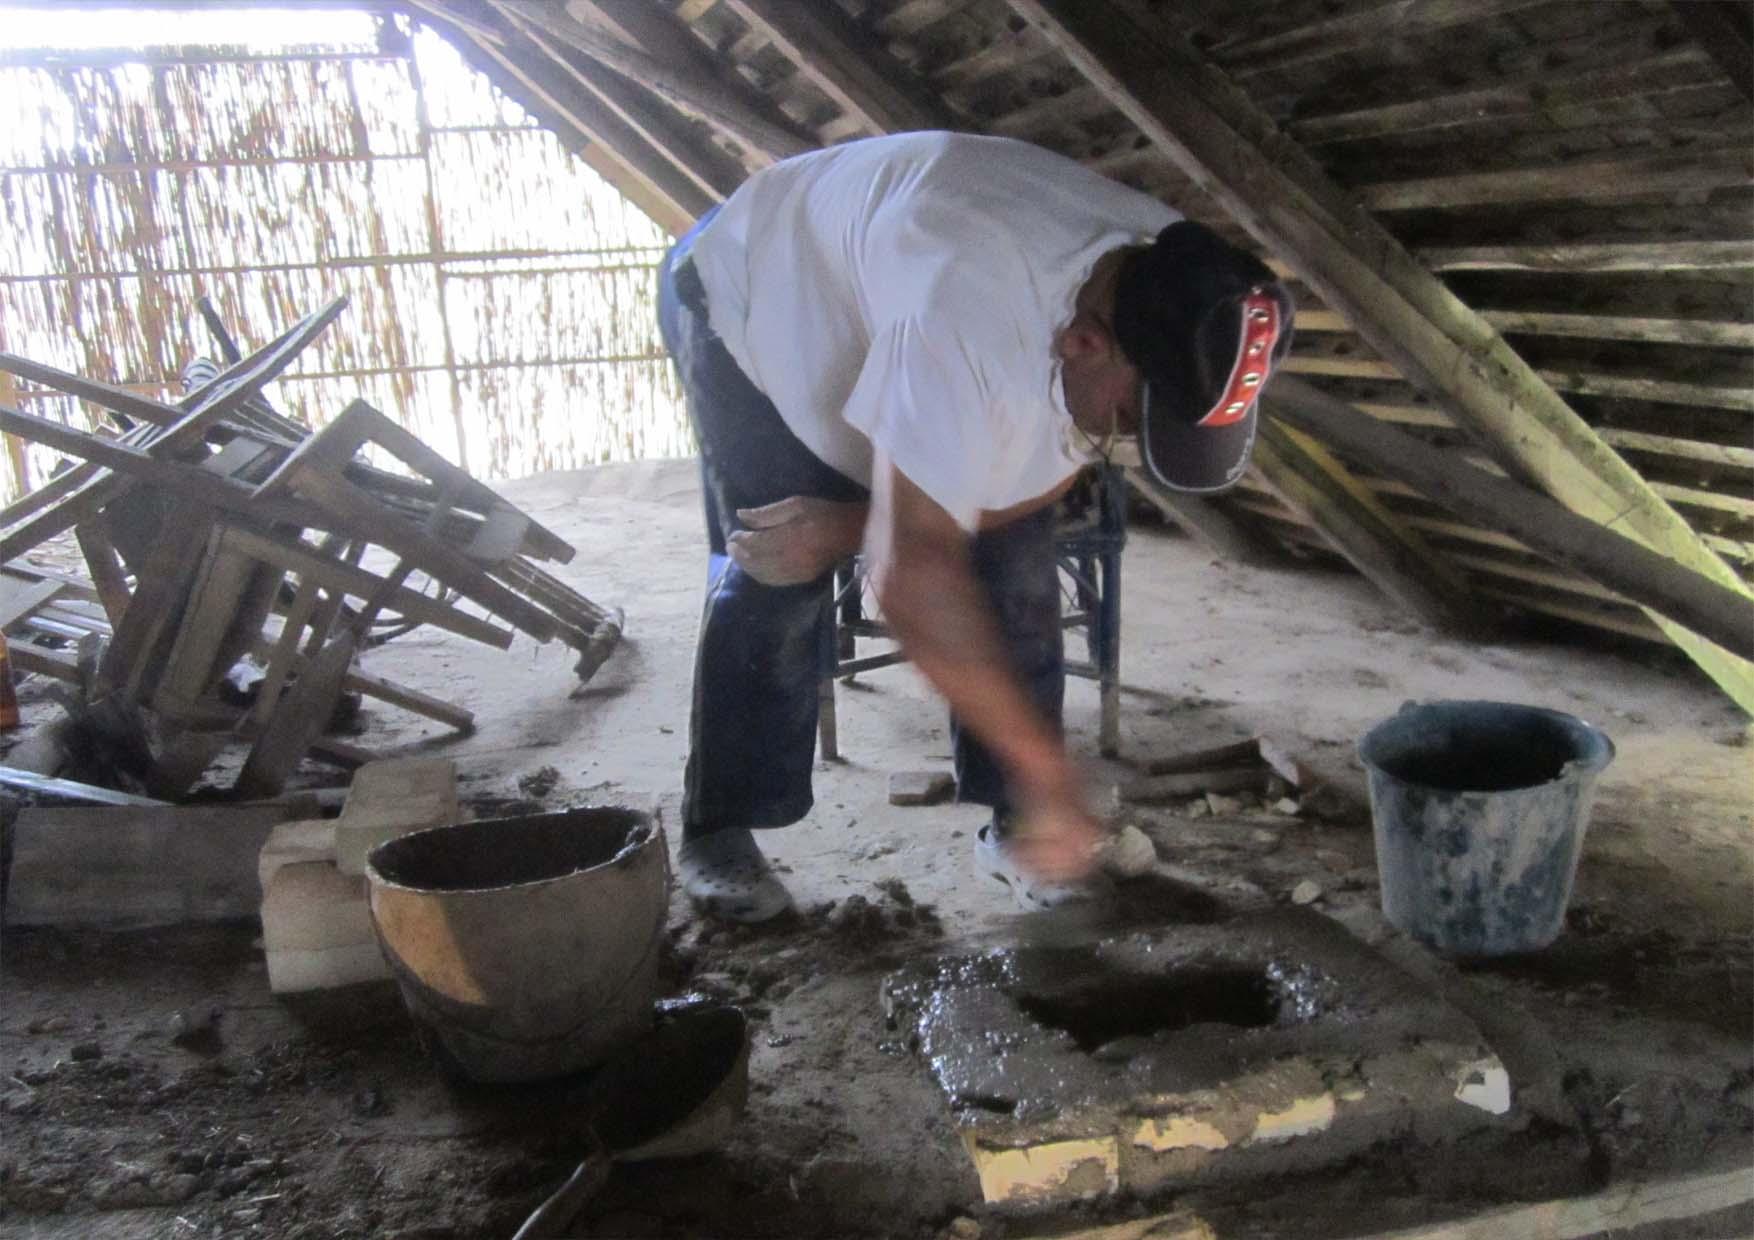 42 Mosorin prosta pec radionica zidanje odzaka  jun 2014